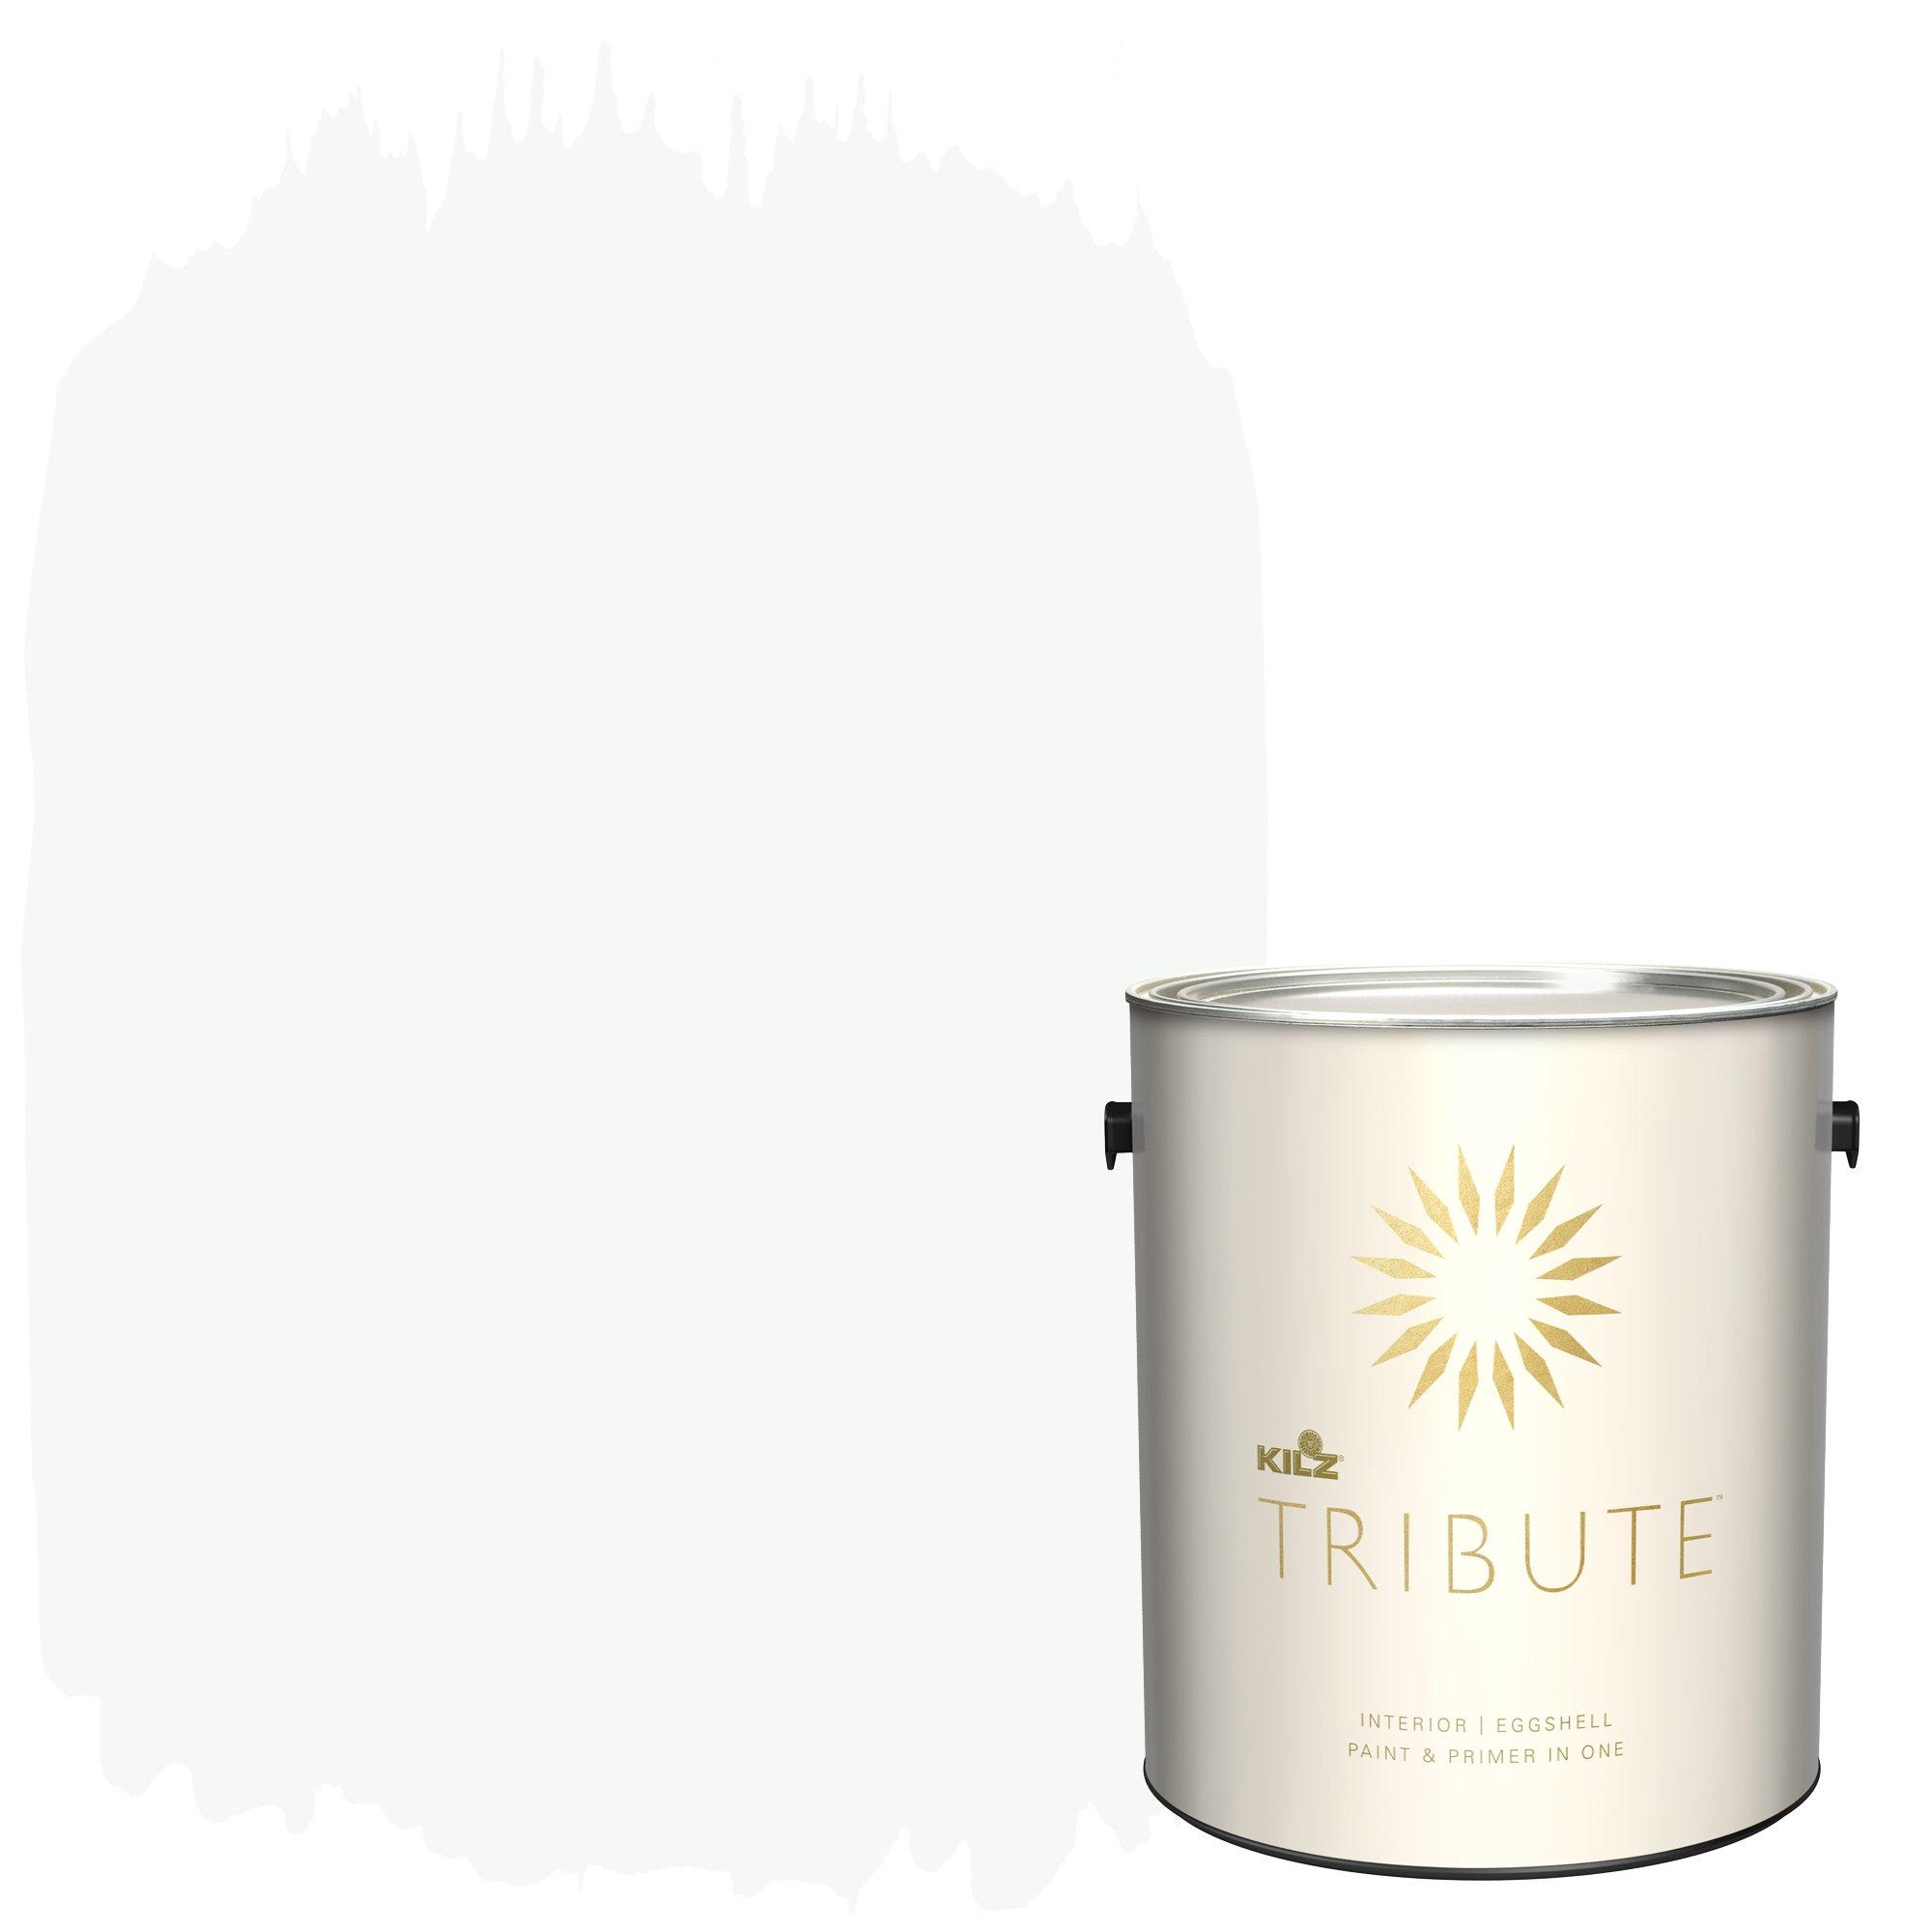 KILZ TRIBUTE Interior Eggshell Paint and Primer in One, 1 Gallon, Ultra Bright White (TB-01)